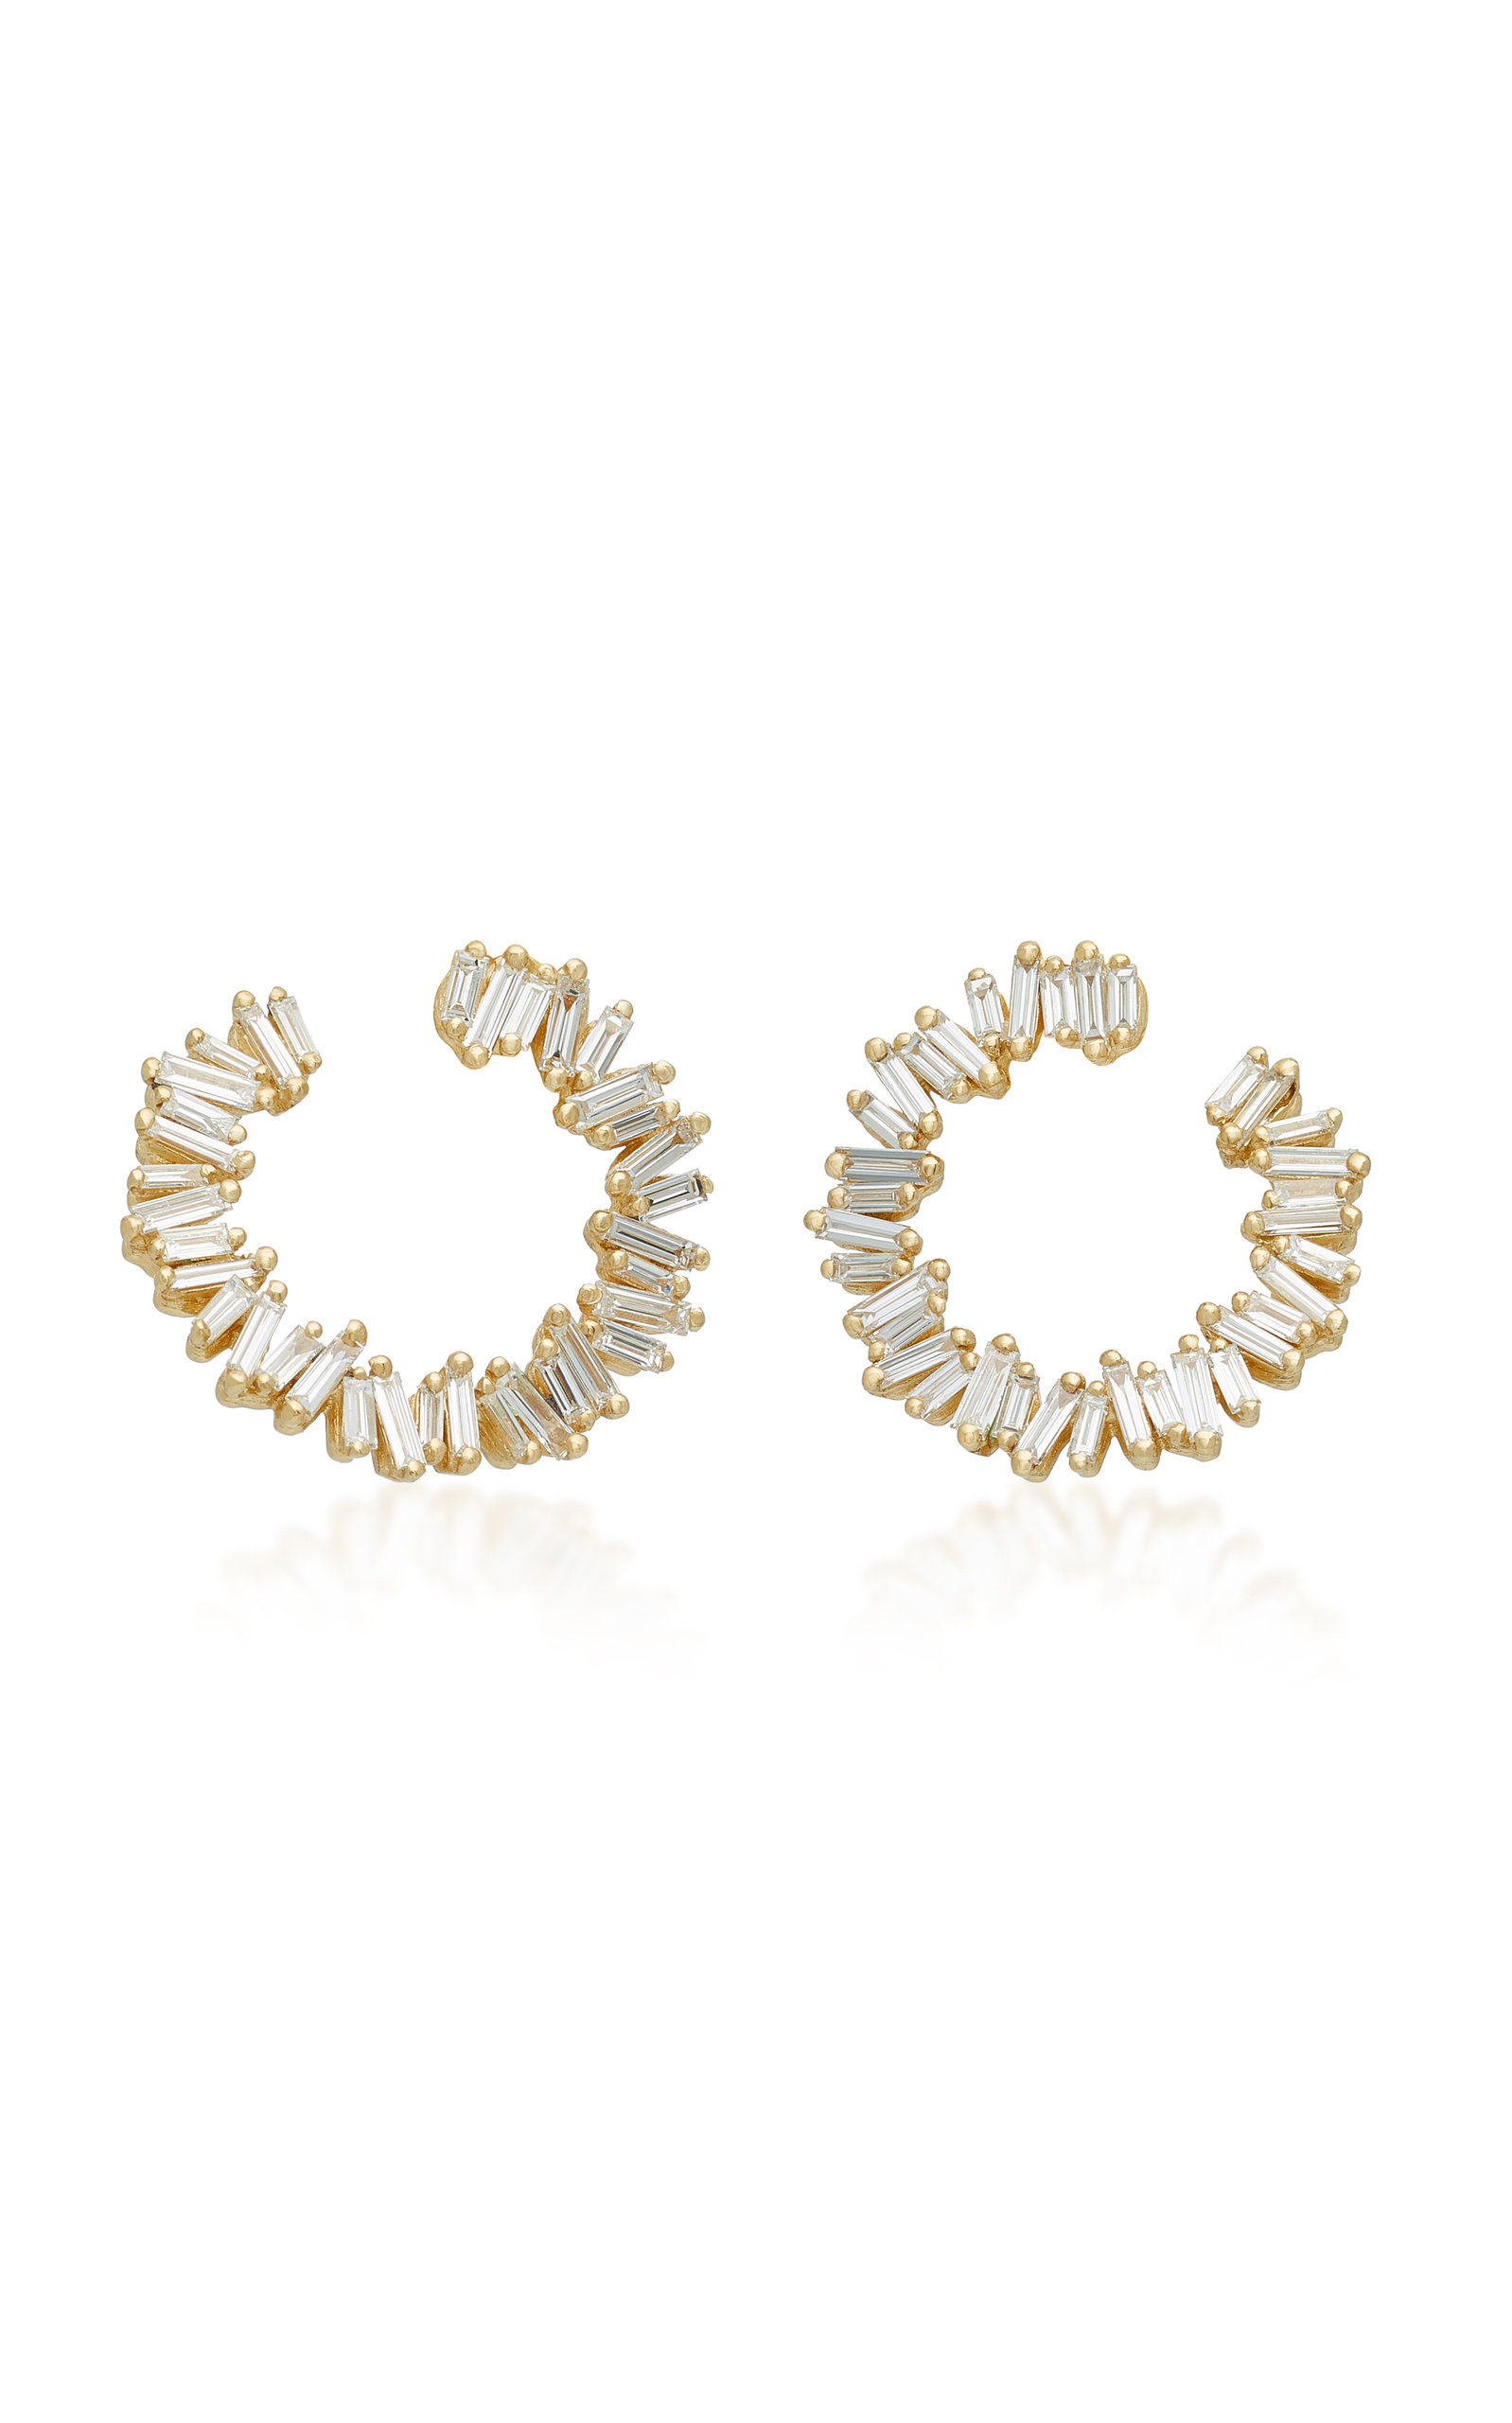 Suzanne Kalan SPIRAL 18K GOLD DIAMOND EARRINGS